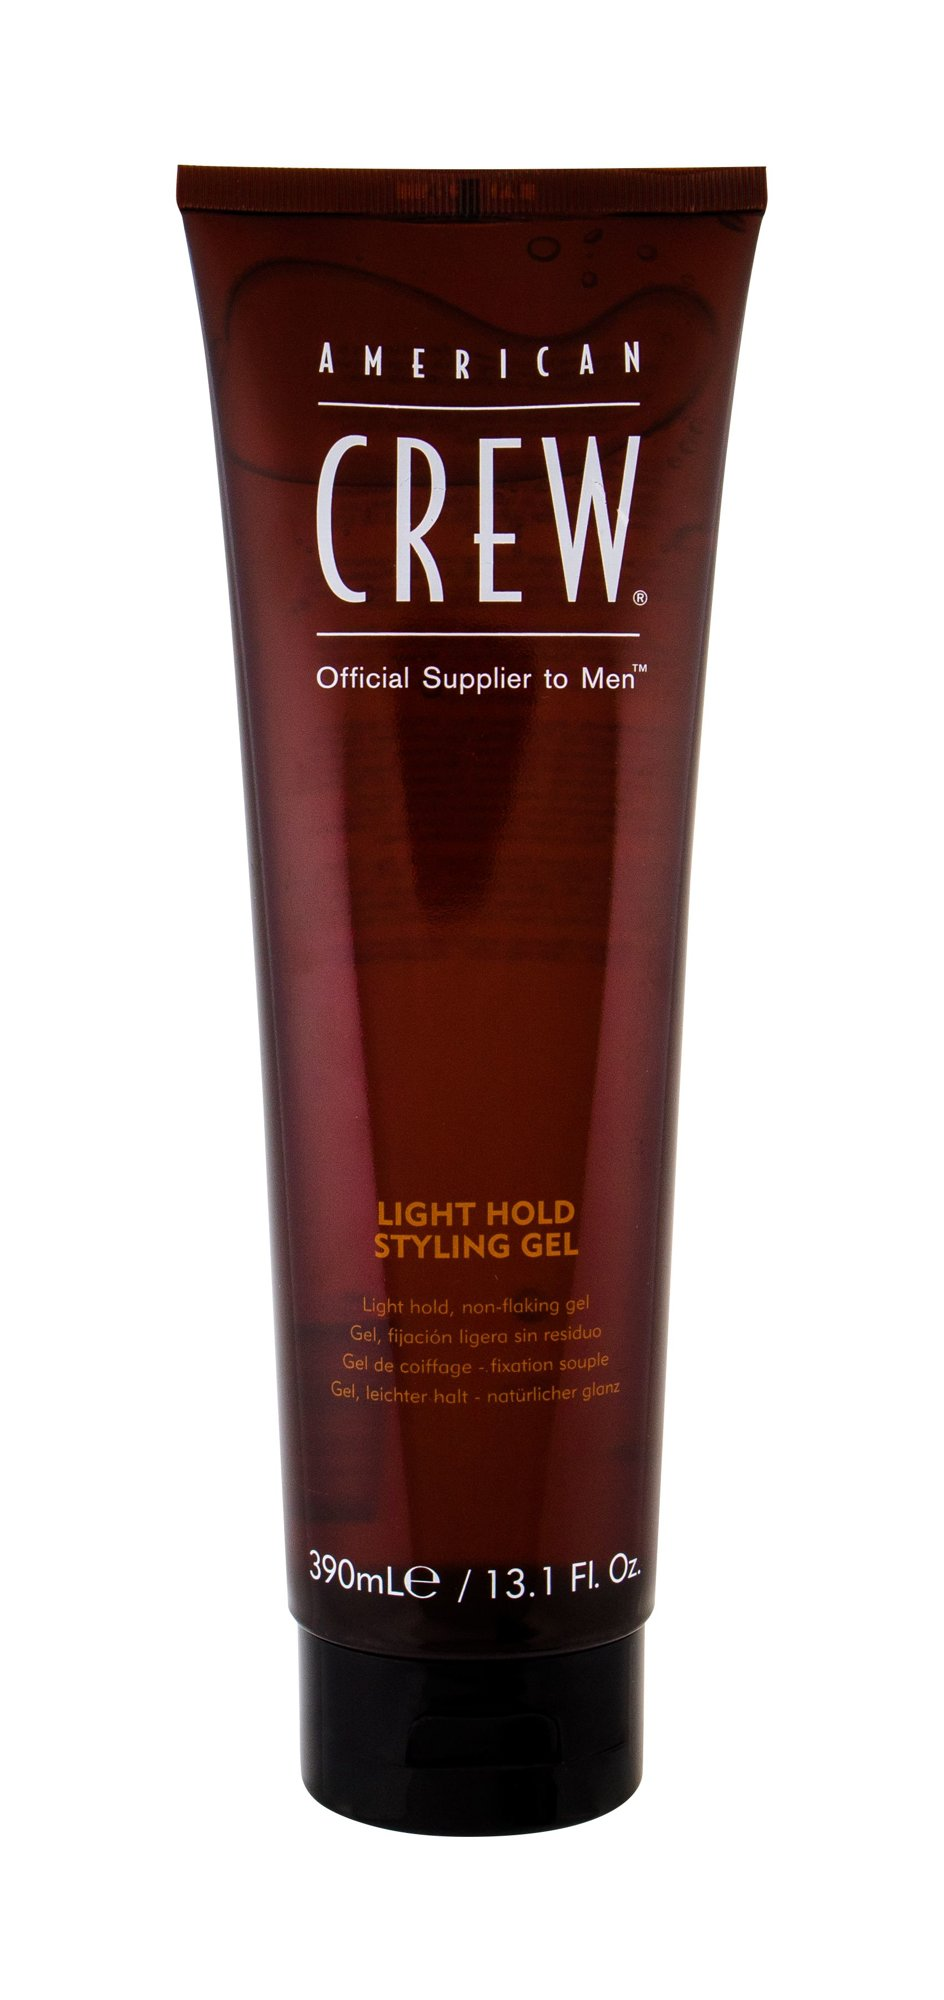 American Crew Style Hair Gel 390ml